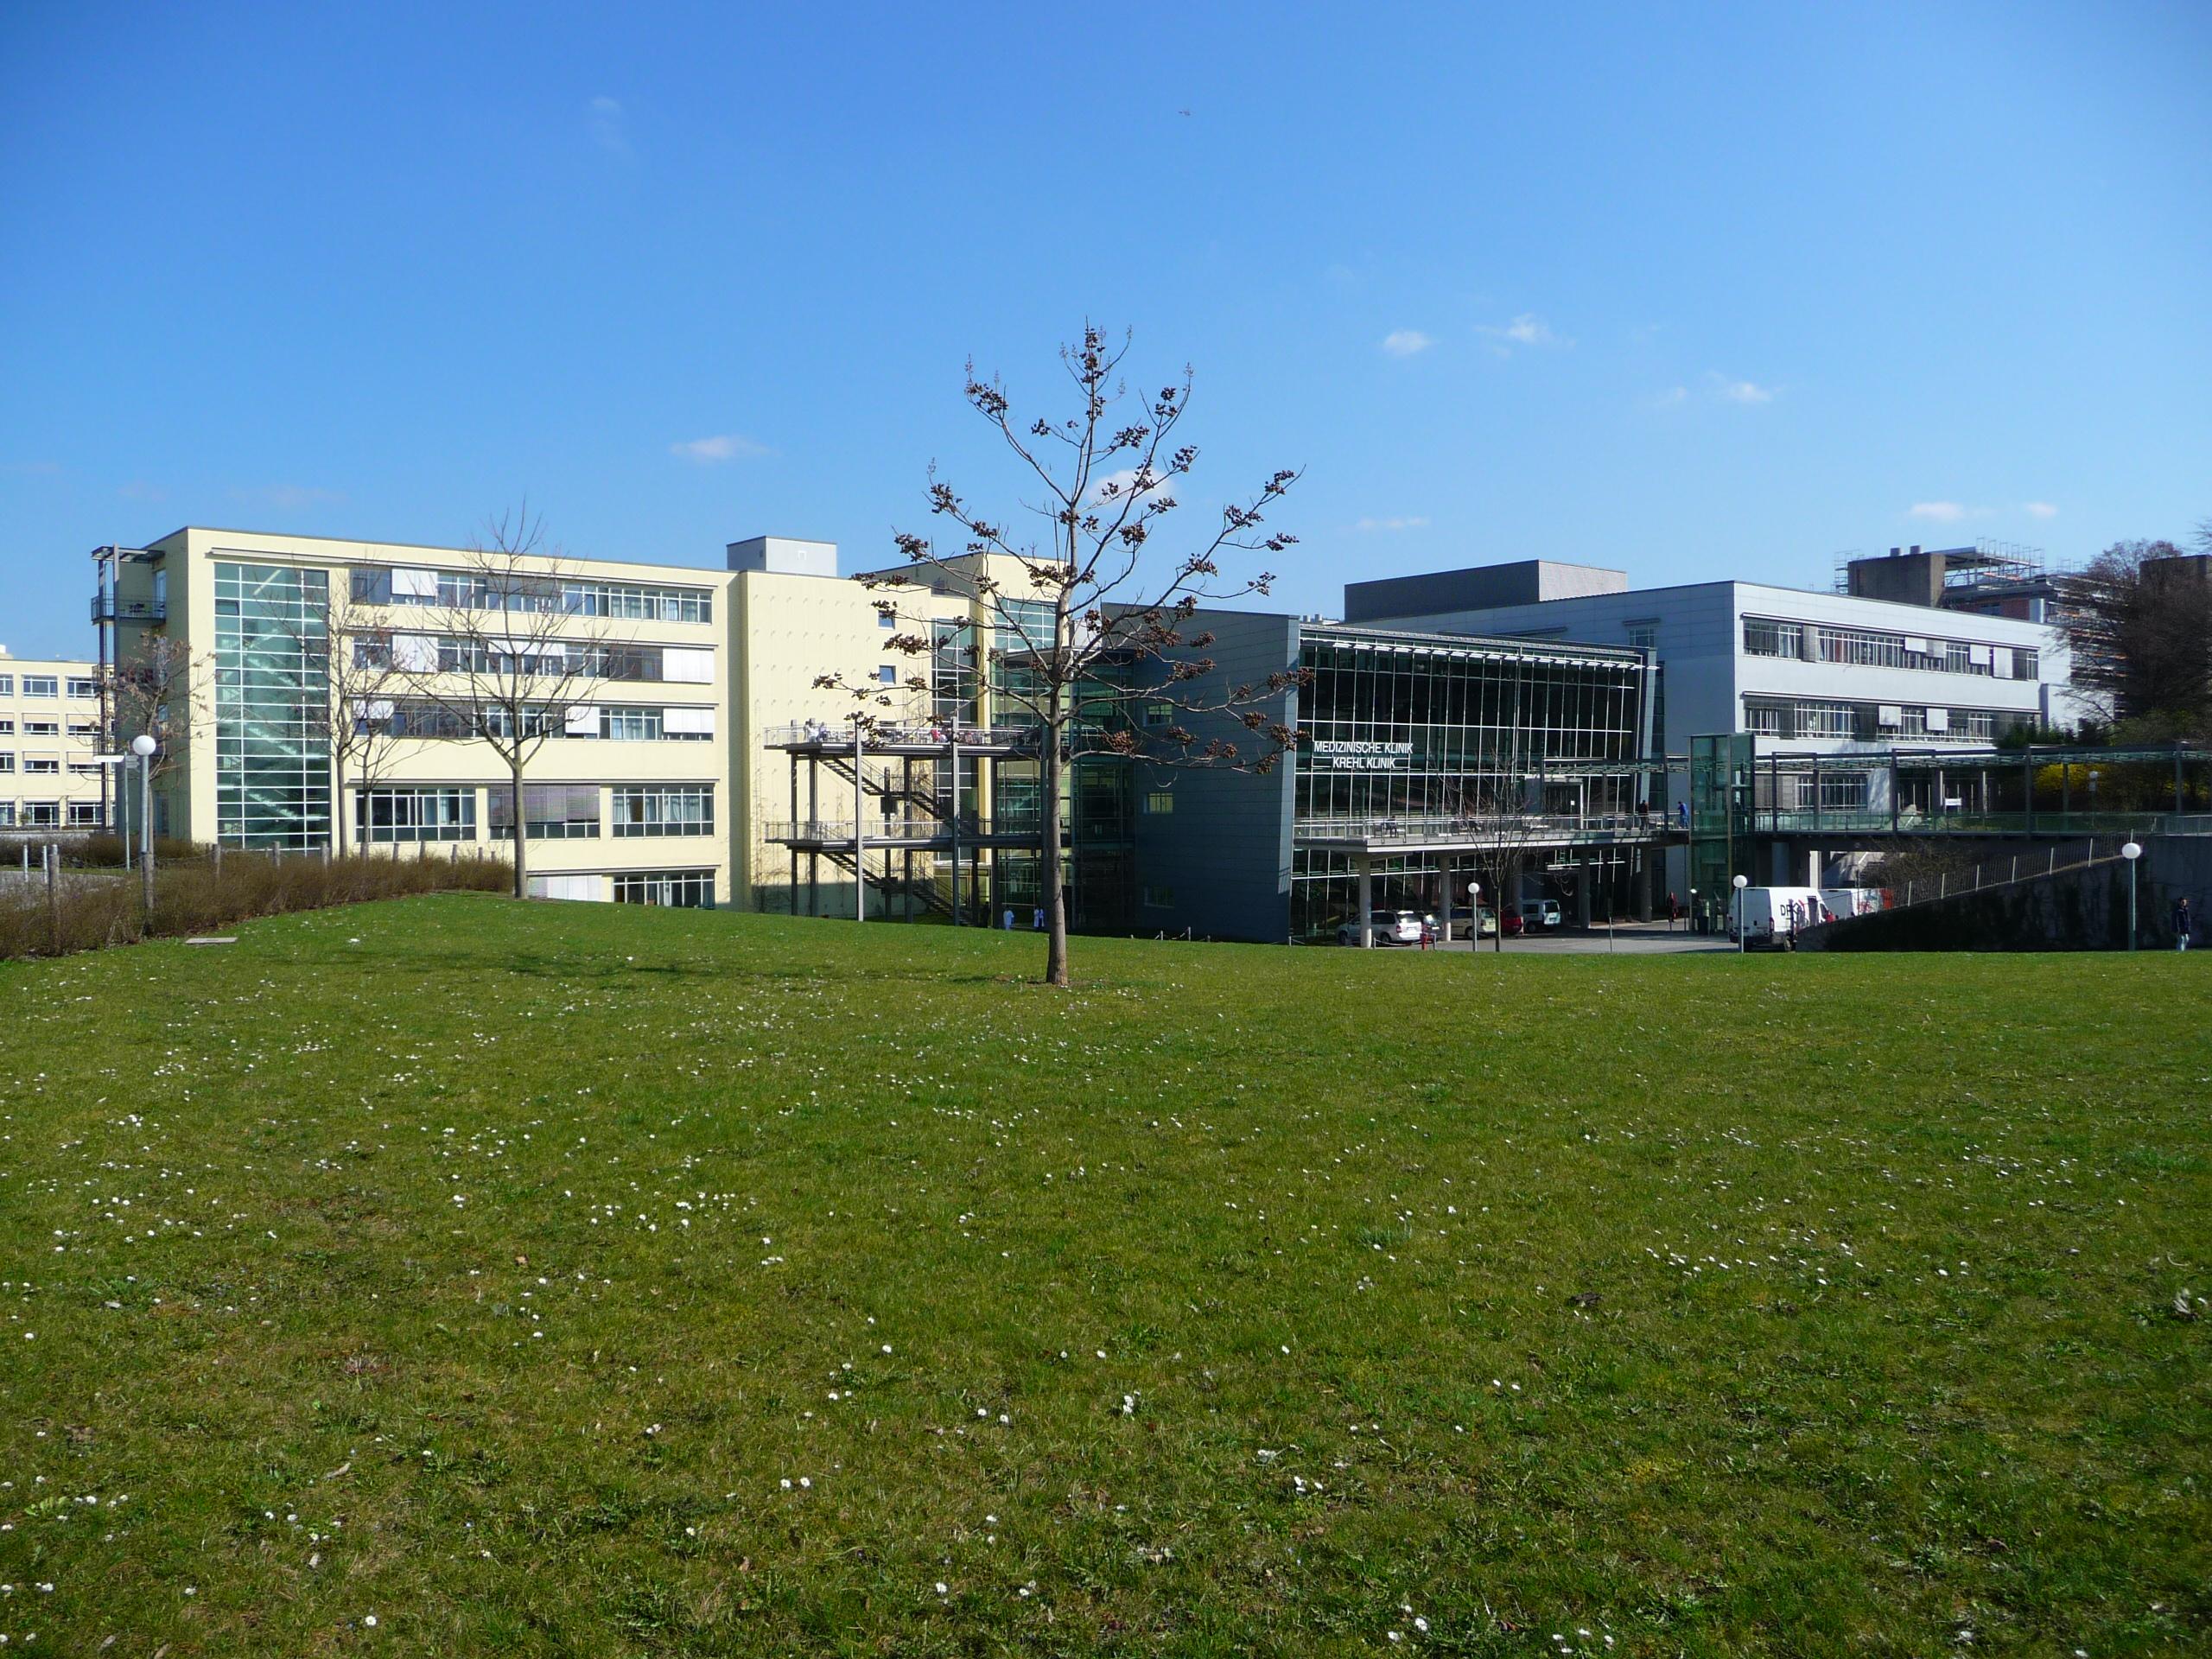 Ruprecht Karl University of Heidelberg